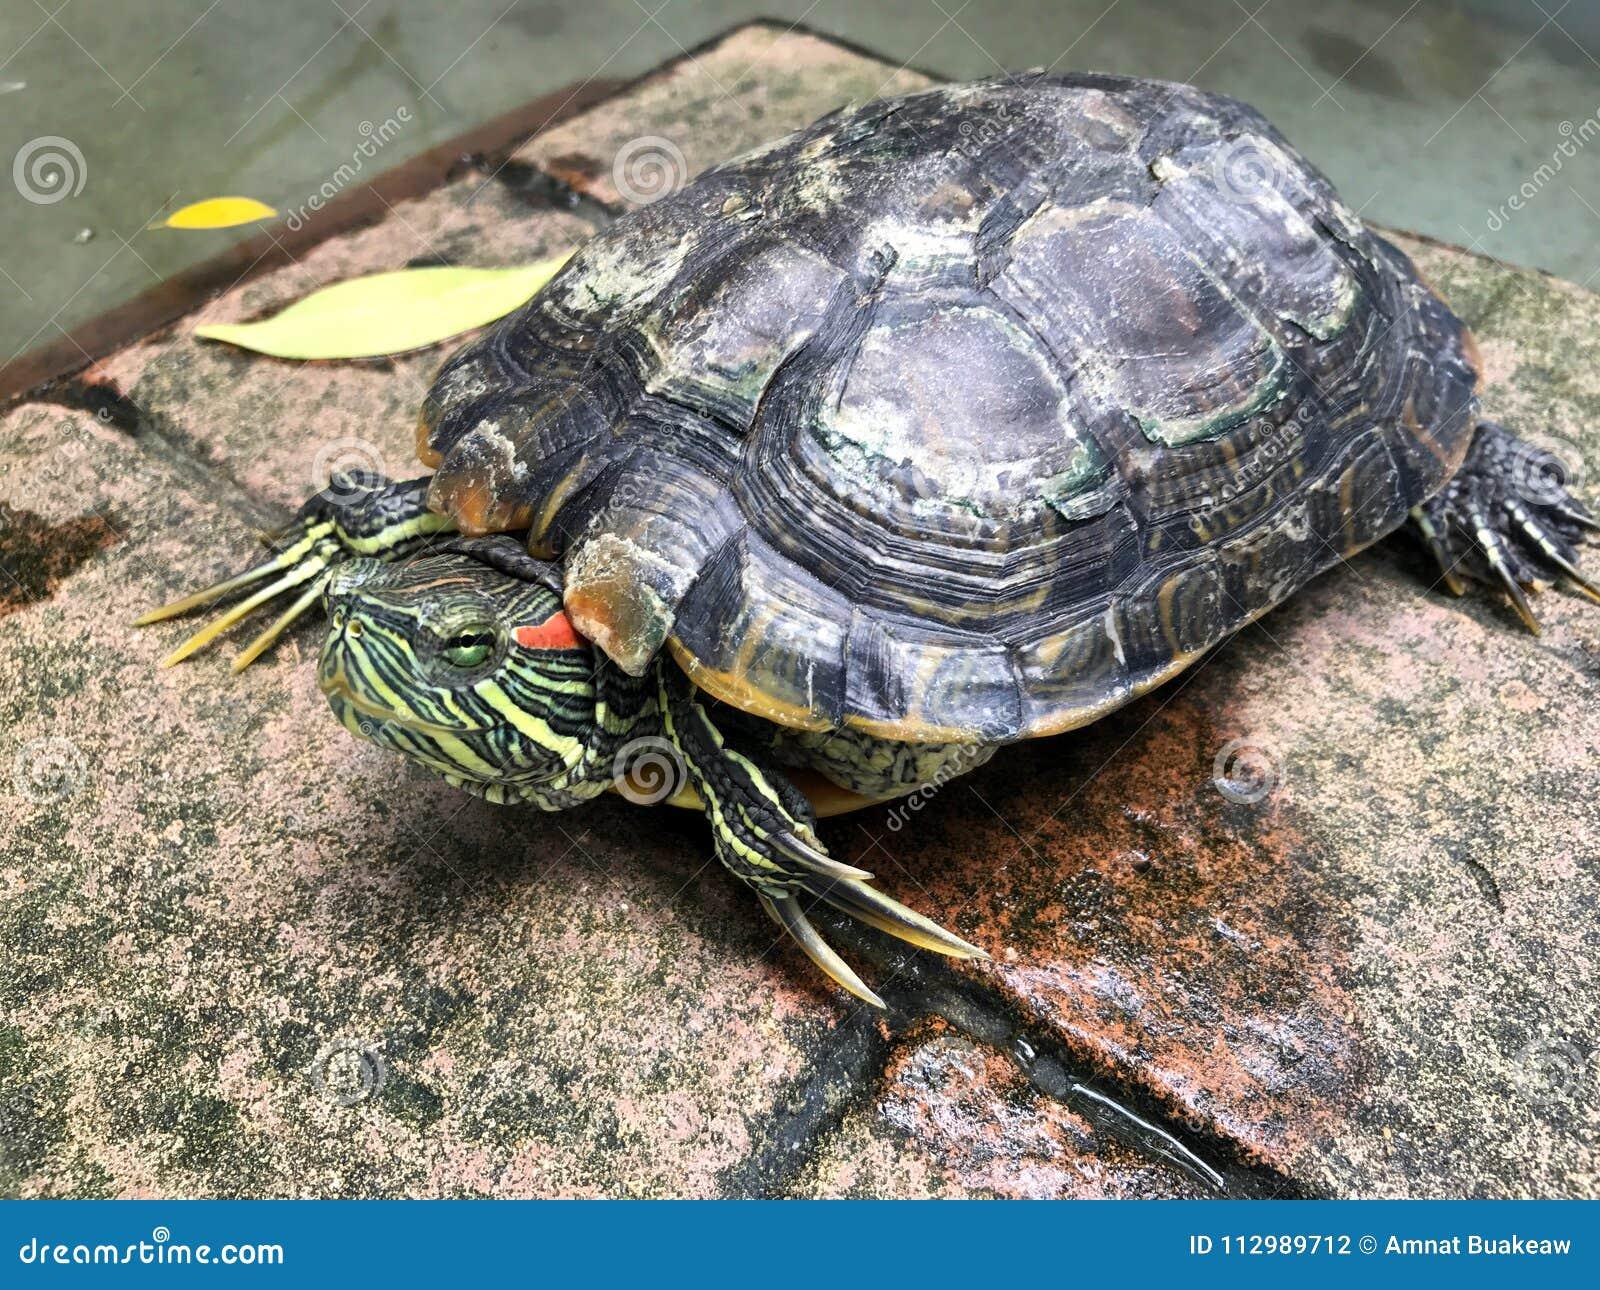 Turtle, Freshwater turtle, beautiful turtle